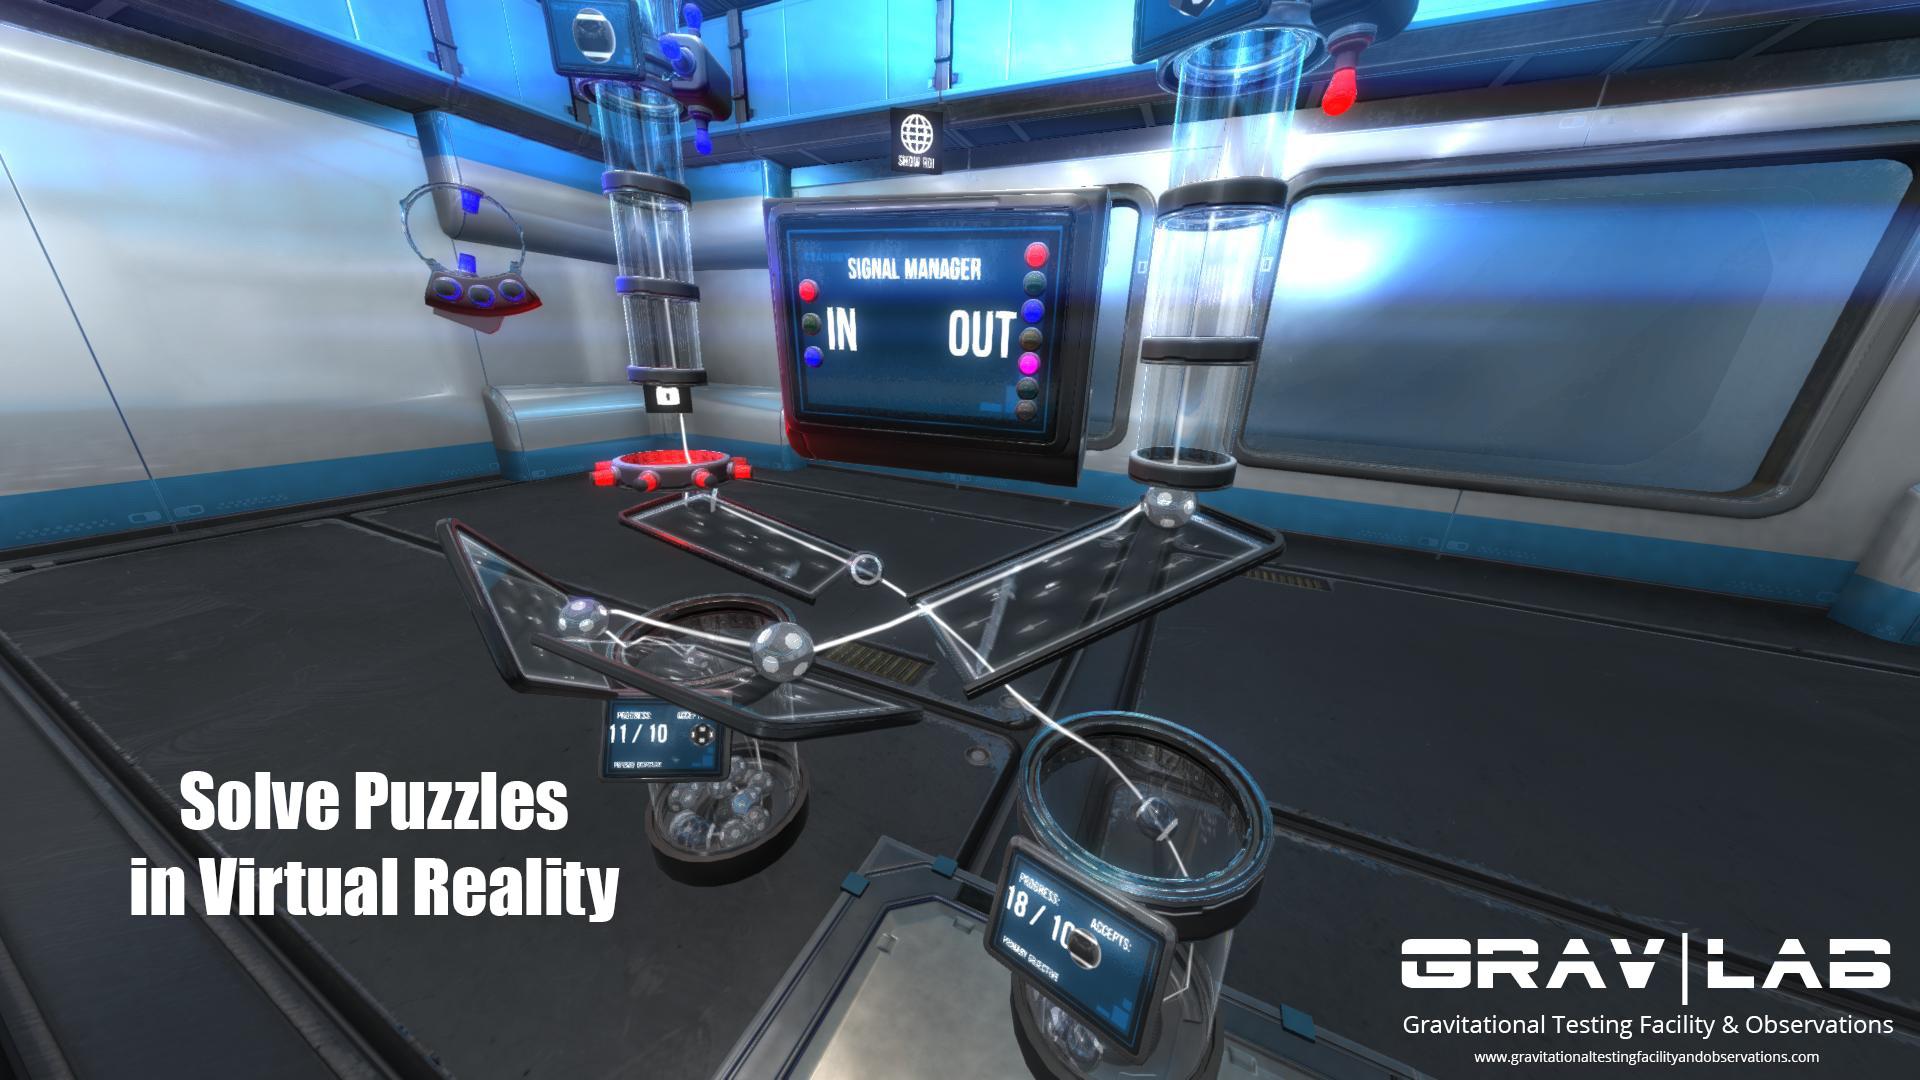 Gravlab-puzzles.jpg